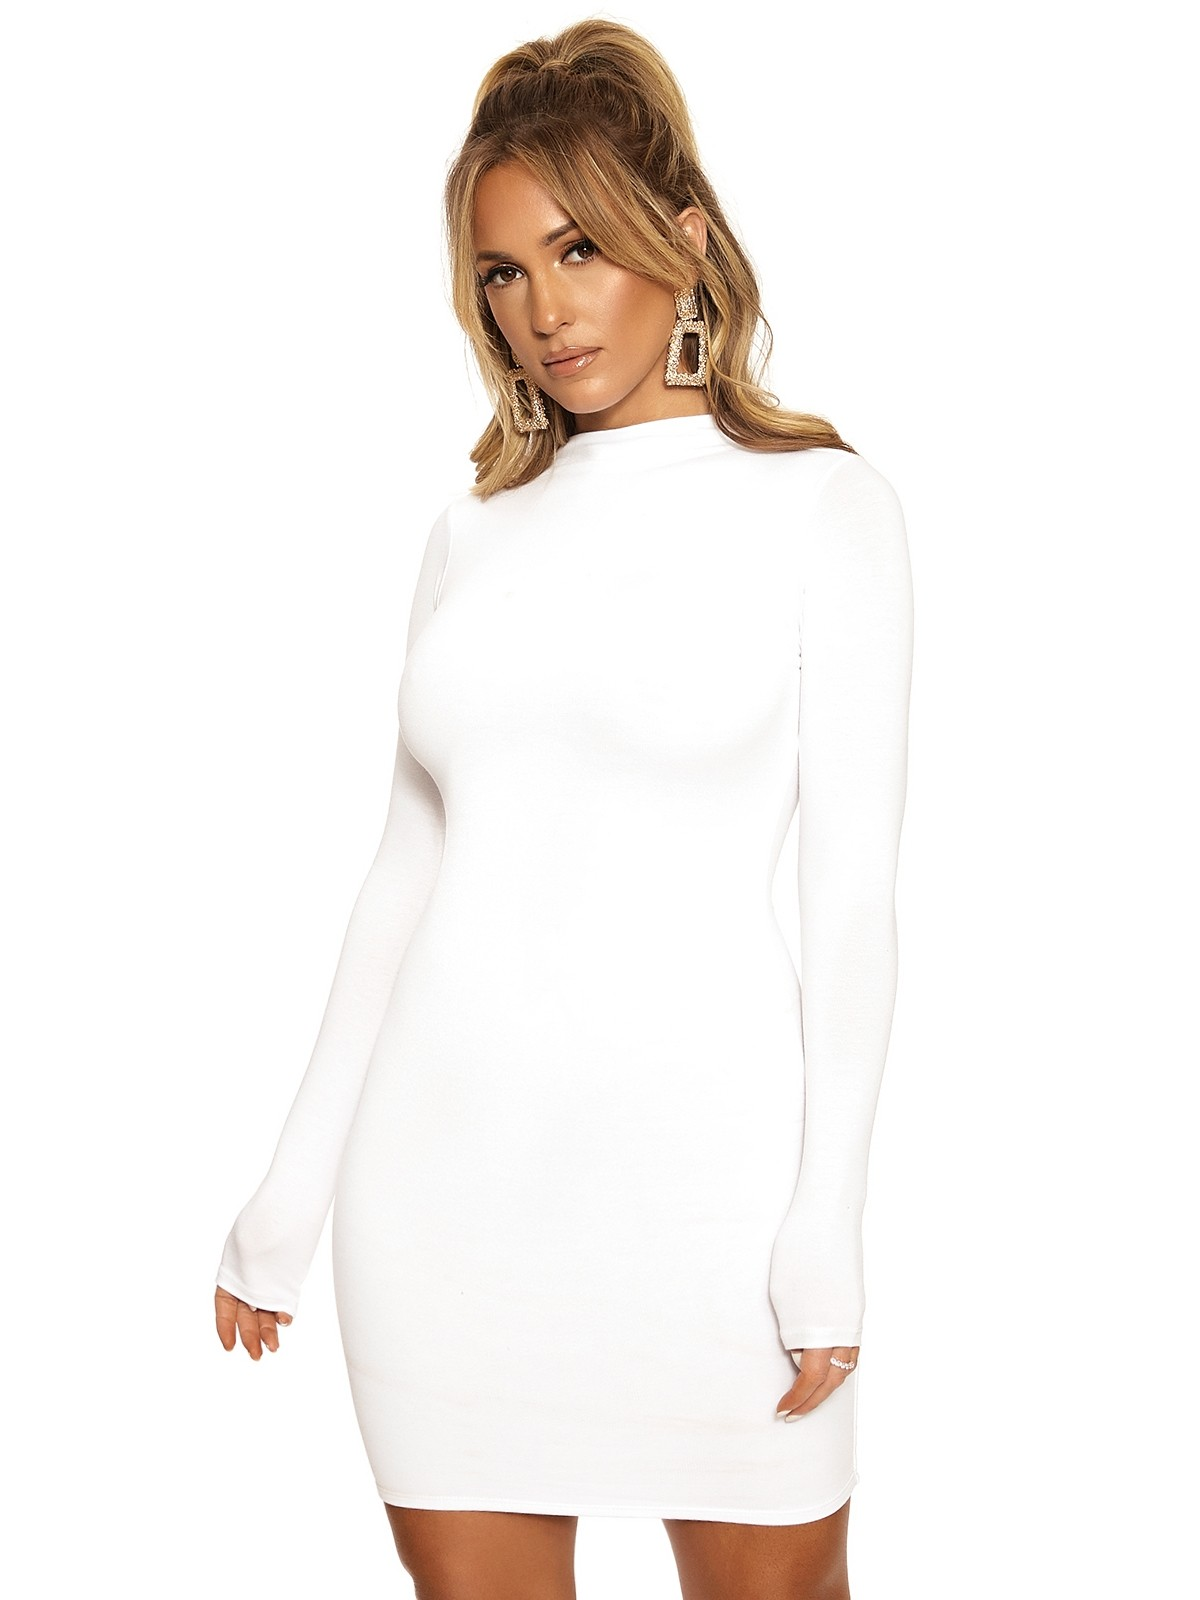 The NW Mini by Naked Wardrobe, available on nakedwardrobe.com for $46 Kylie Jenner Dress SIMILAR PRODUCT